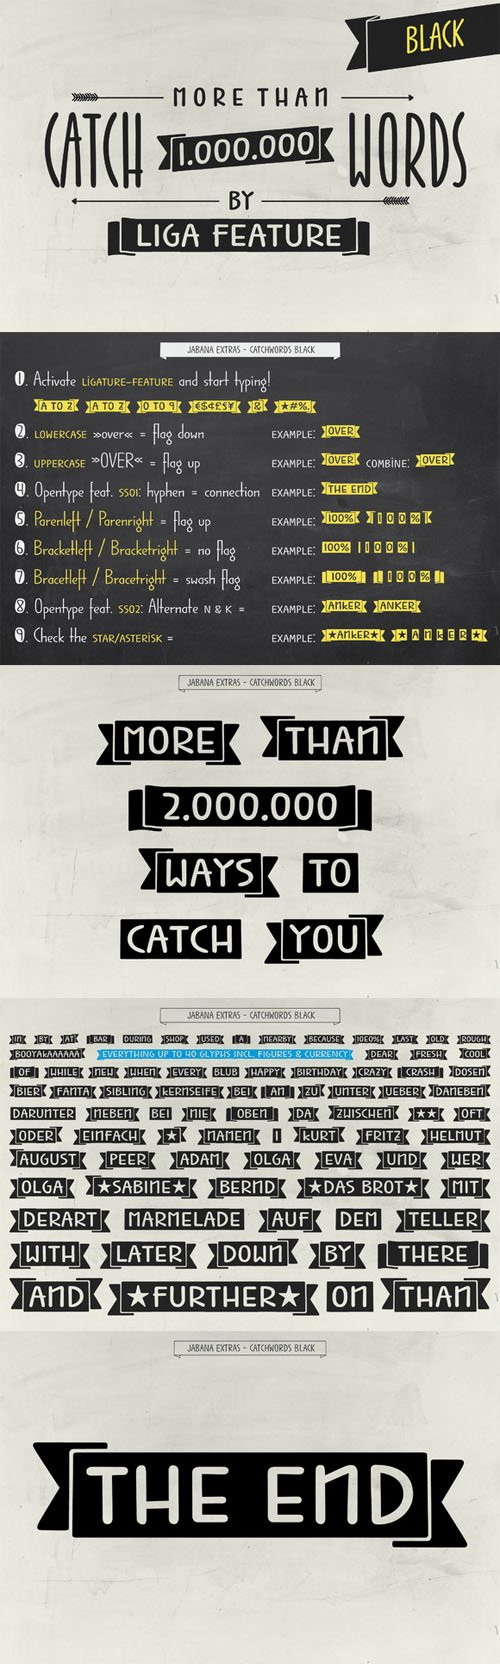 1.000.000 Catchwords Black - Jabana - Creativemarket 234432